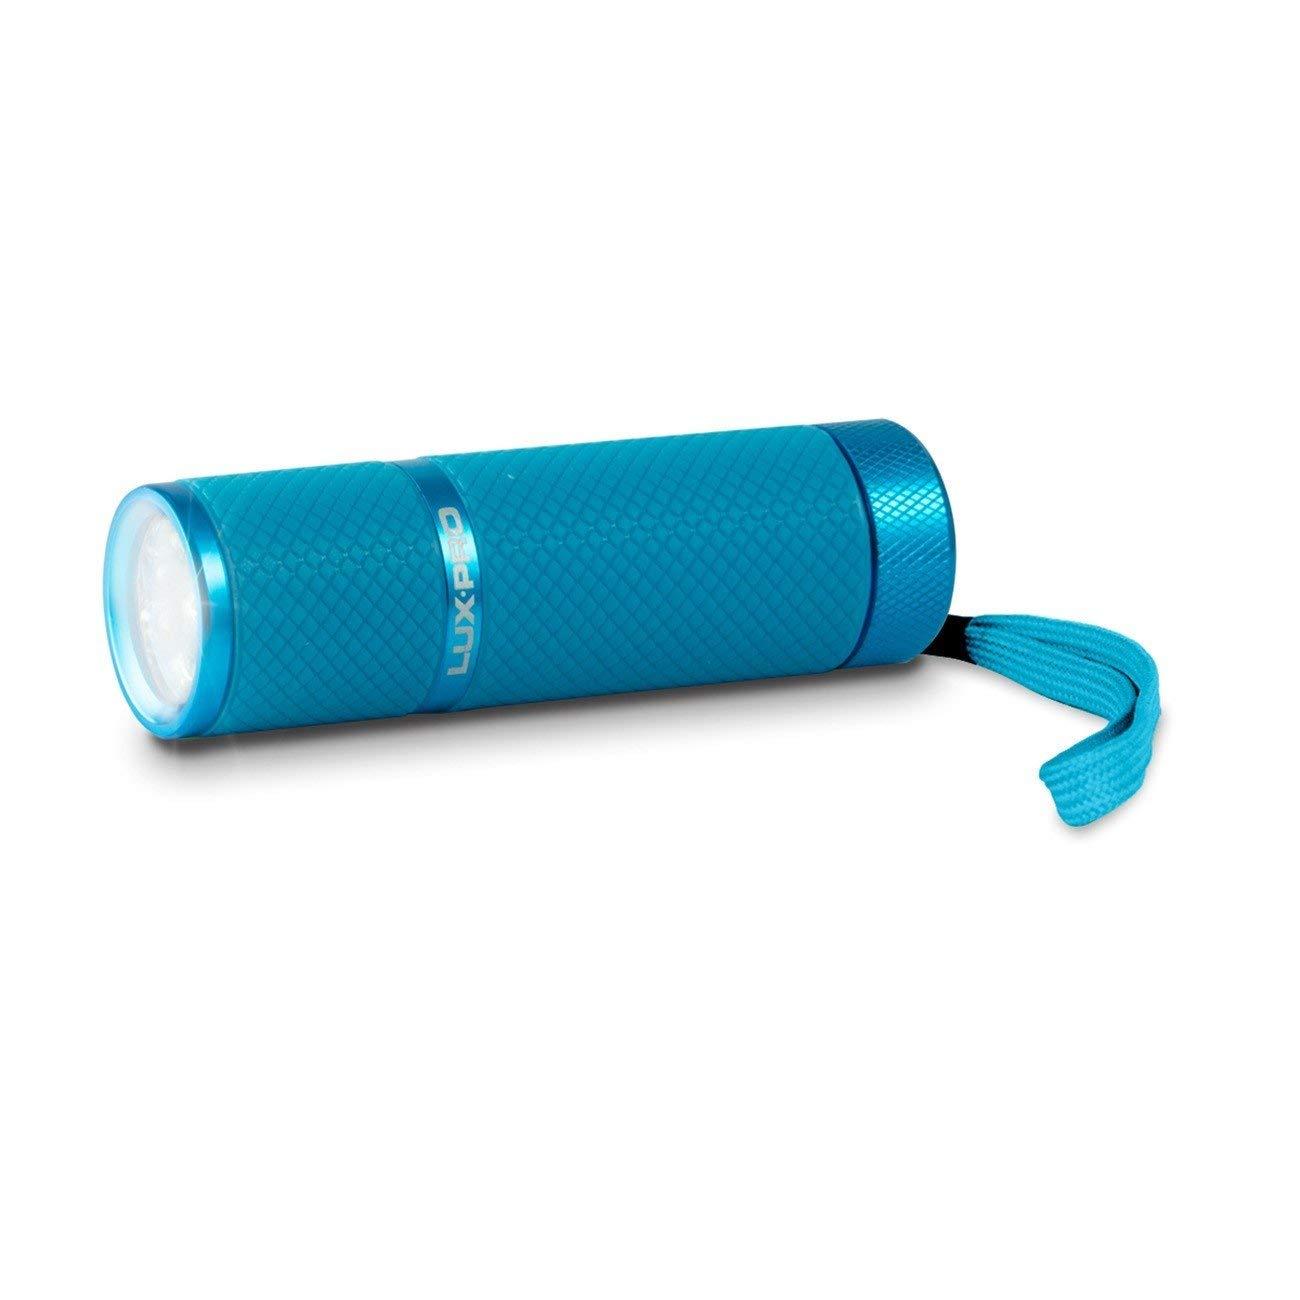 Lux-pro lp395-lb Gels Glow in Dark 9 LED Taschenlampe, Light Blau